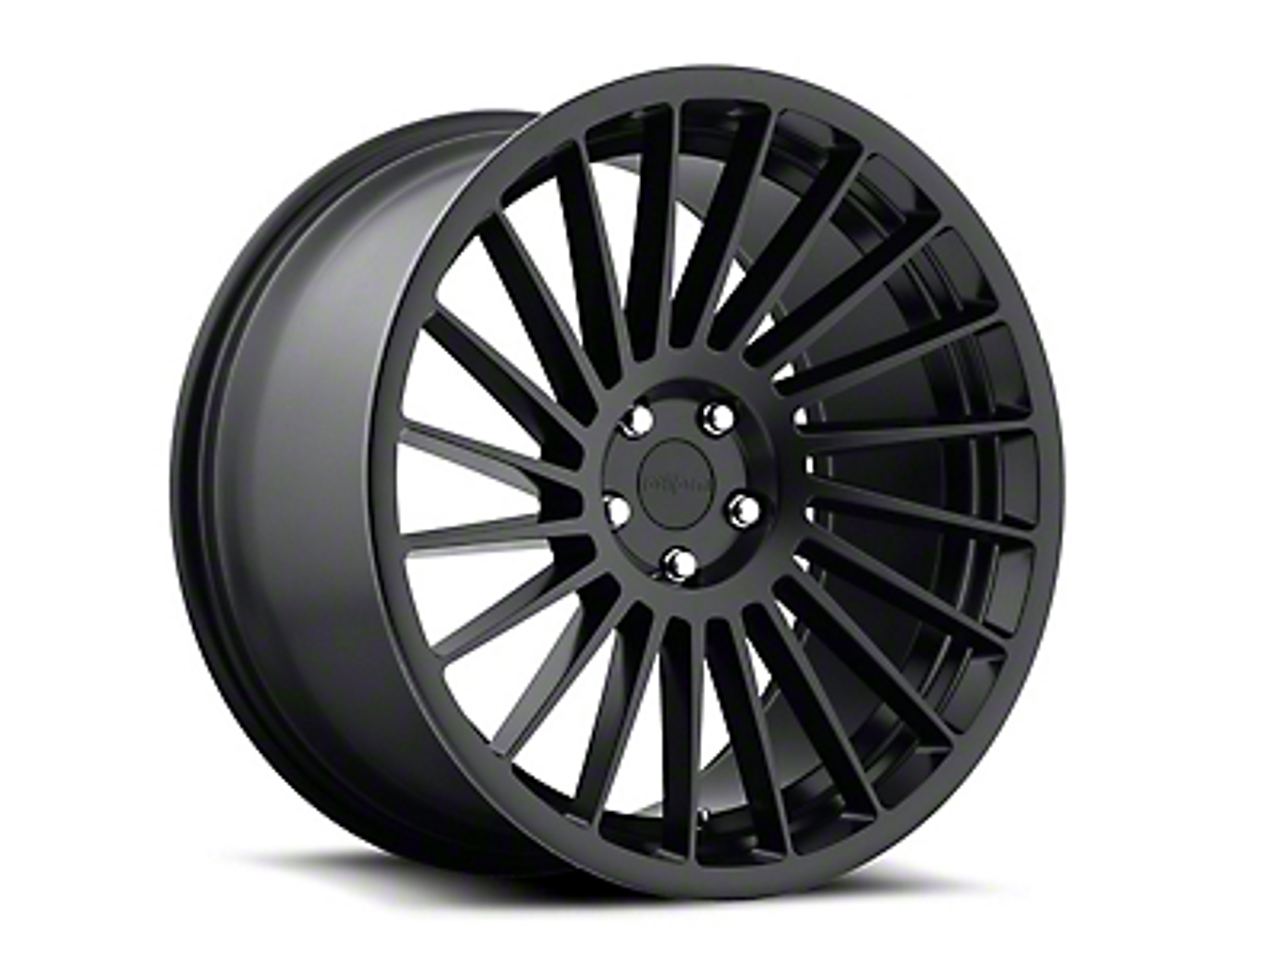 Rotiform CCV Black Machined Wheel - Passengers Side - 20x10 (05-14 All)